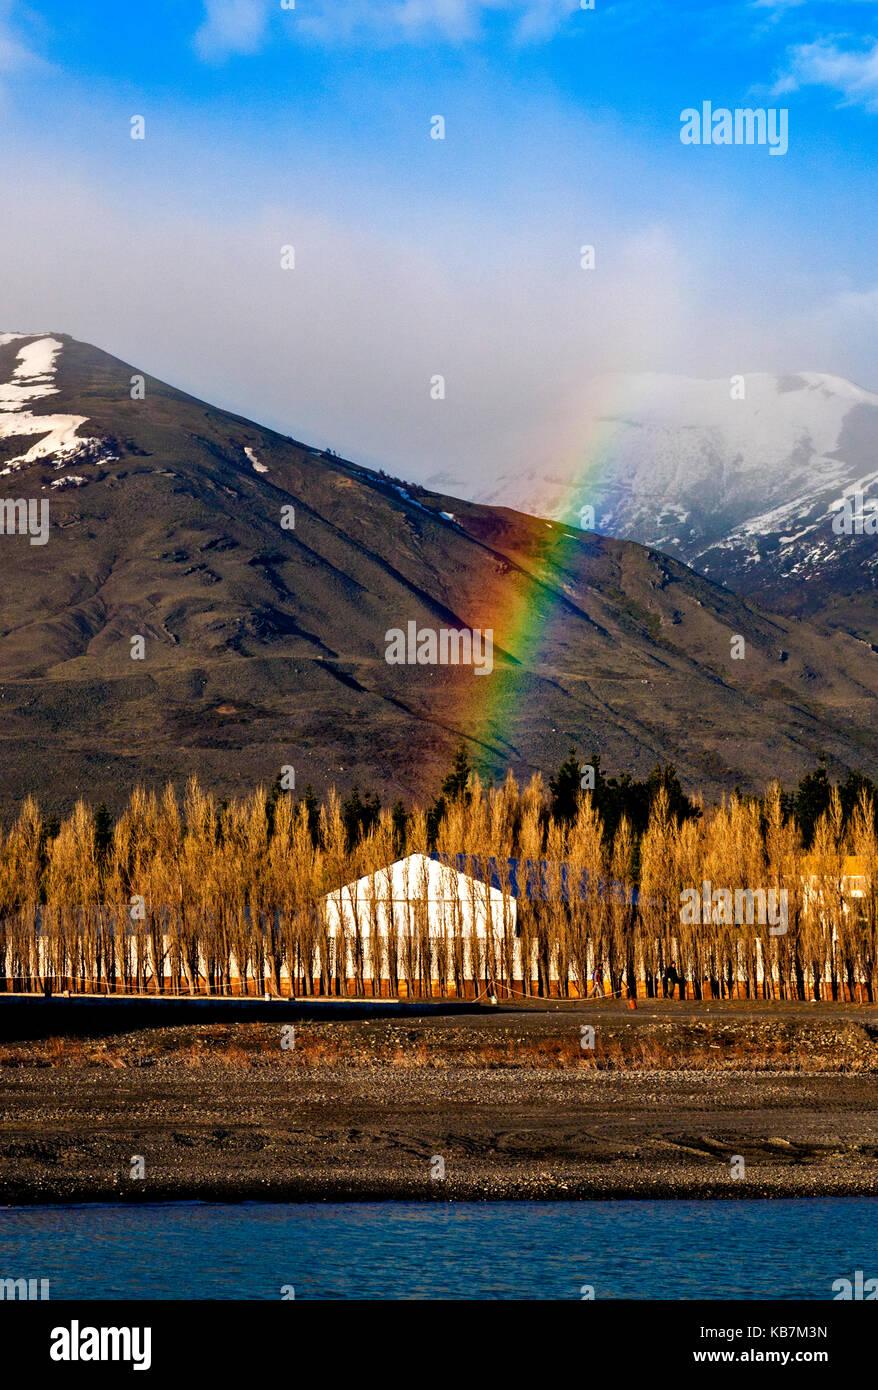 El Calafate, Santa Cruz, Argentina - Stock Image